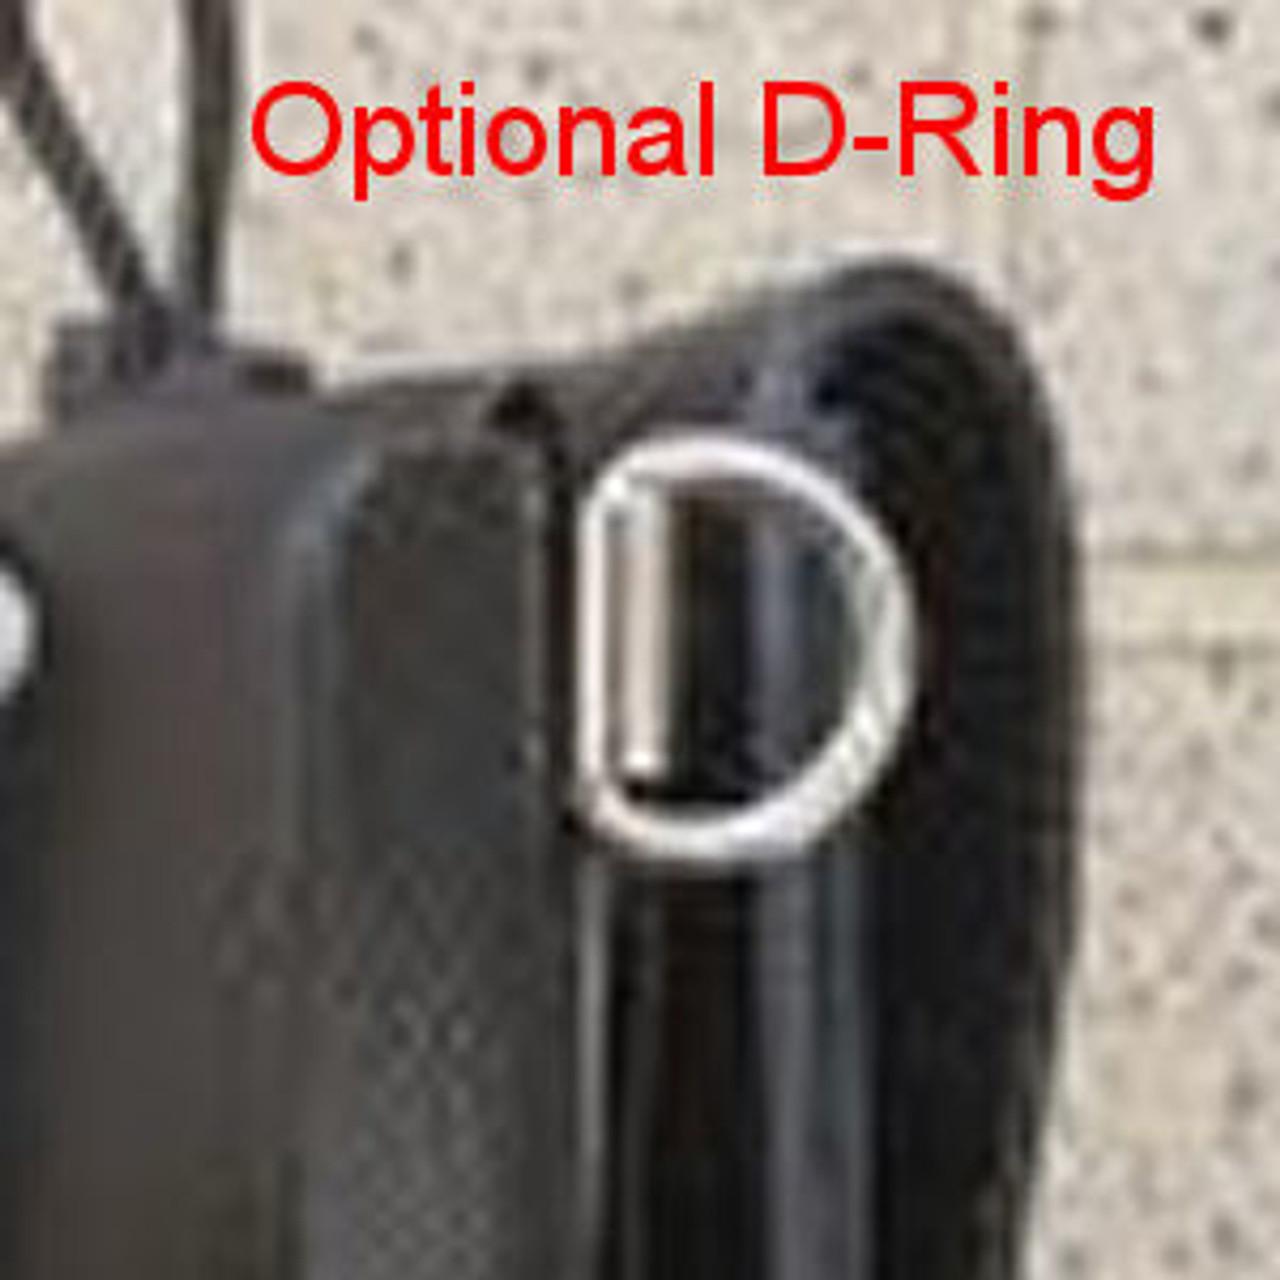 Motorola APX6000 Custom Radio Case With Optional D-Ring